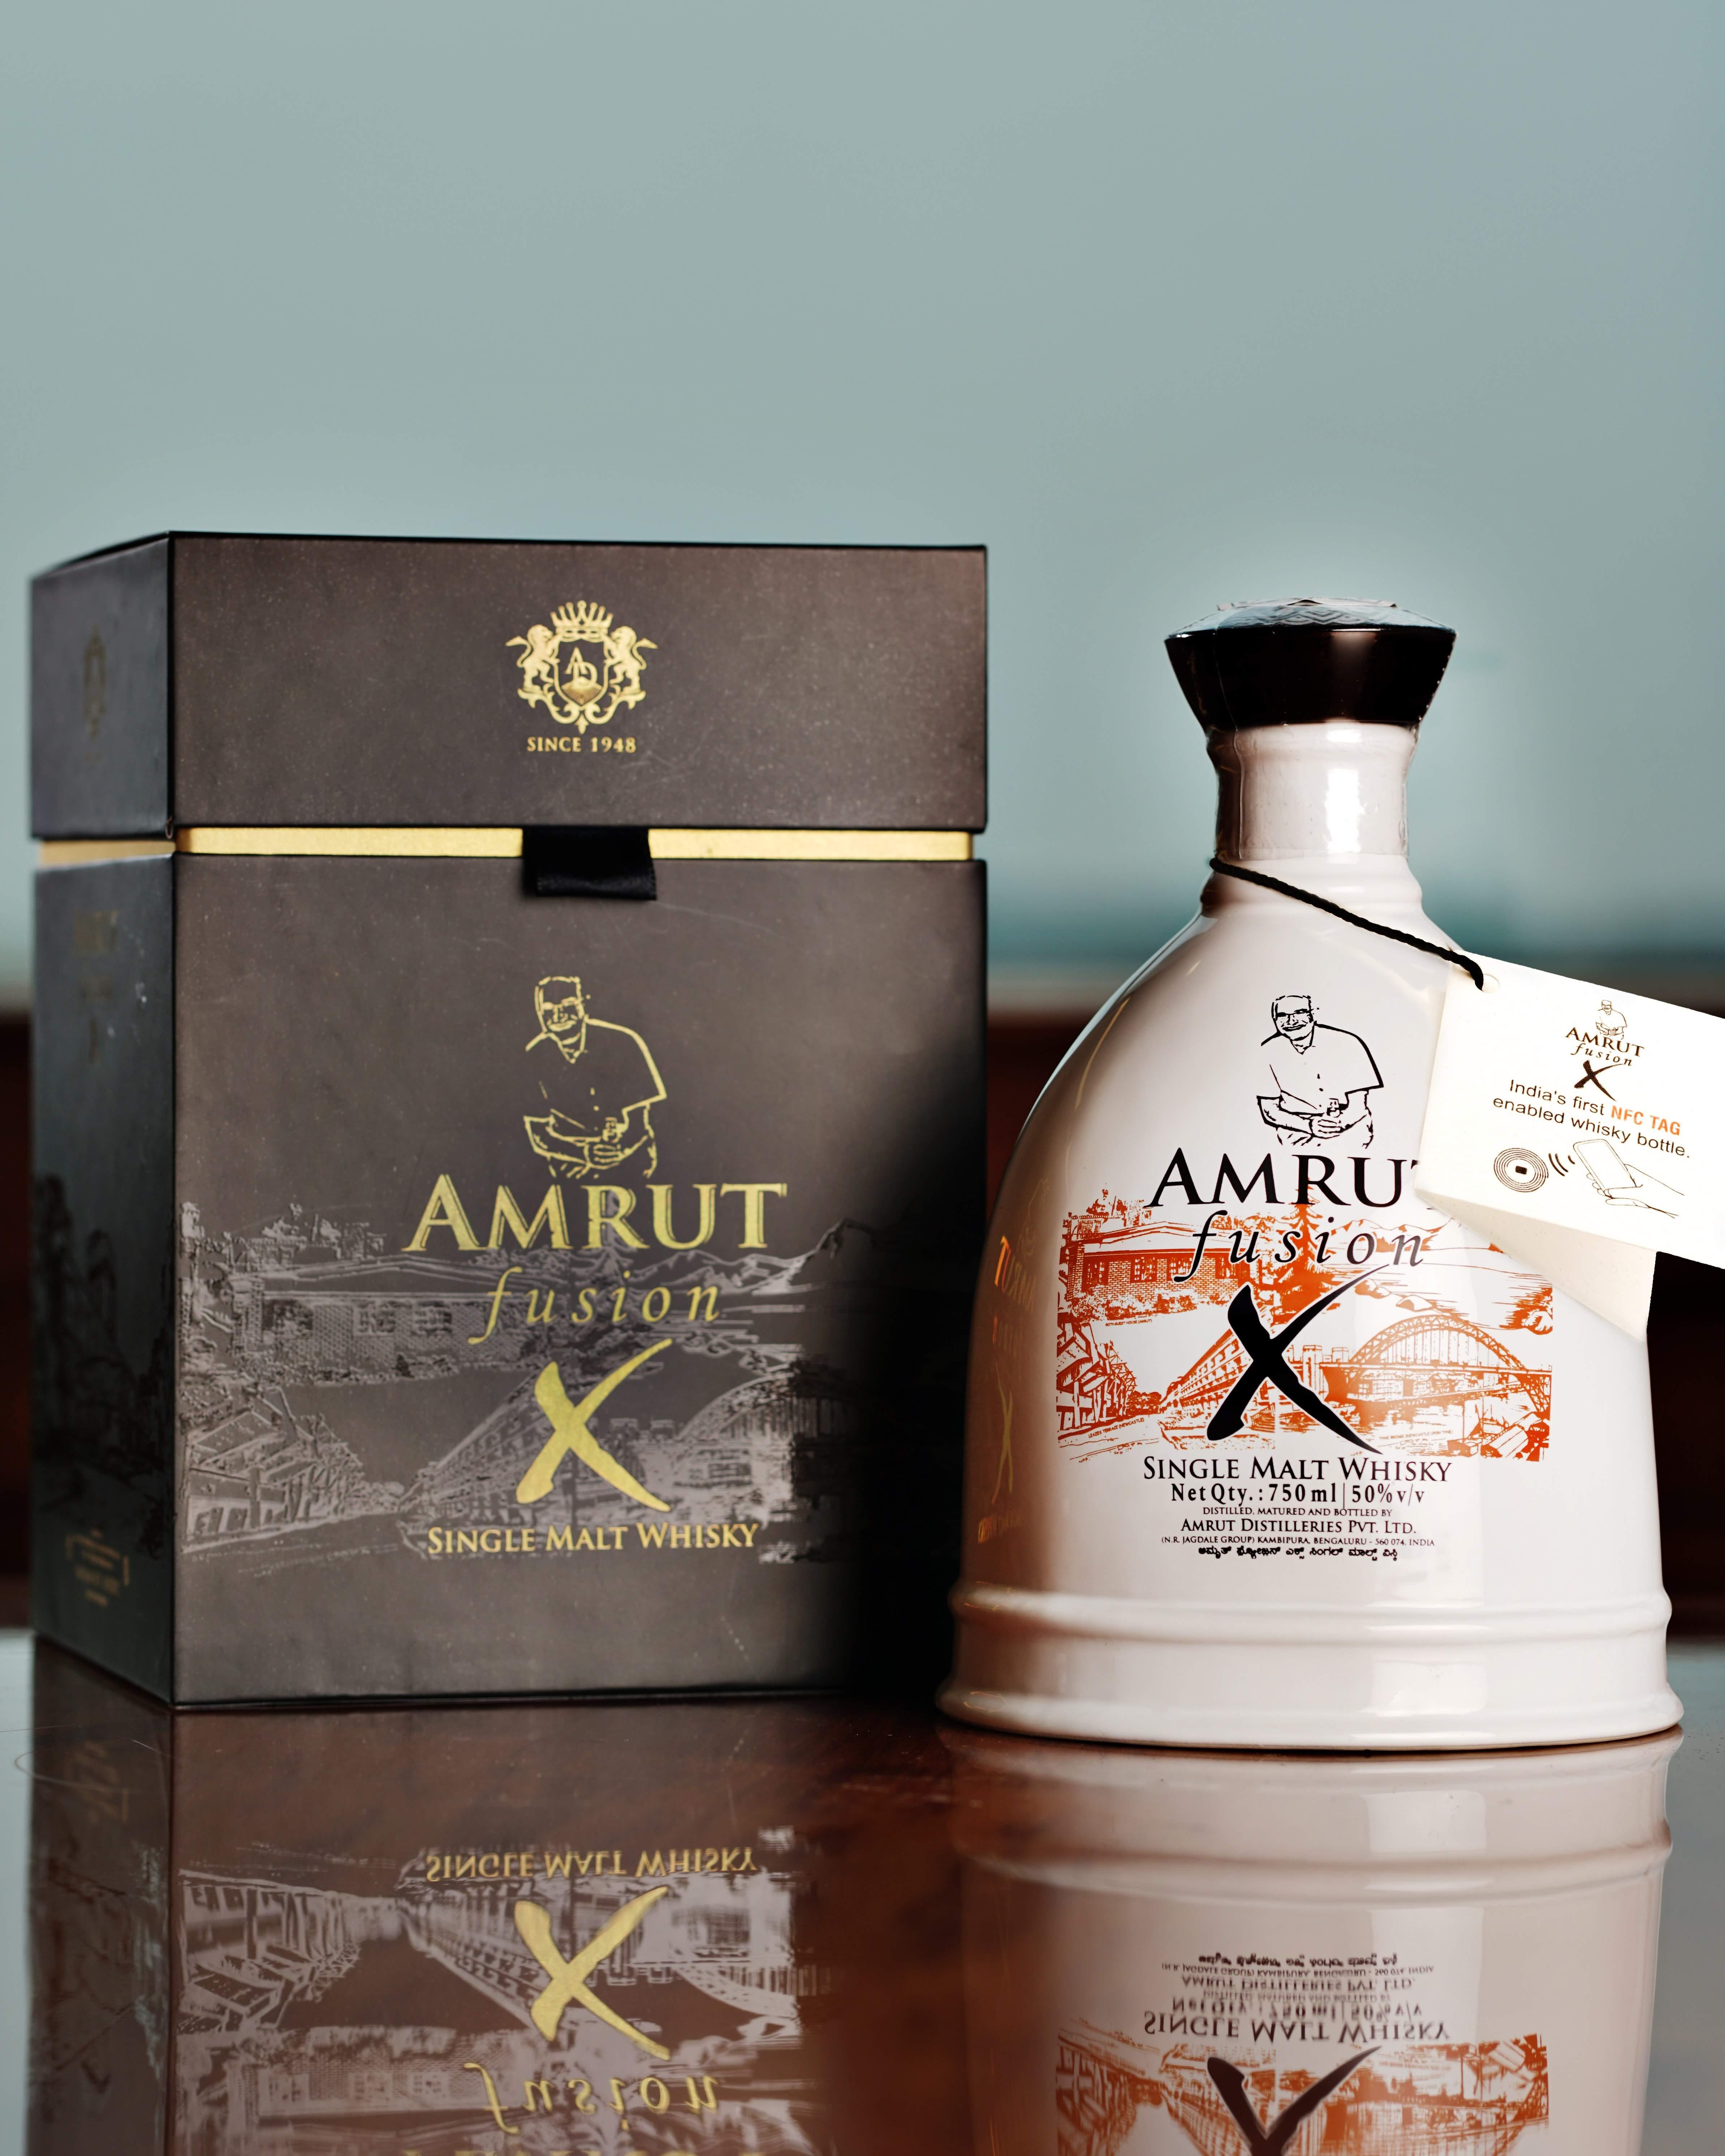 The Amrut Fusion X